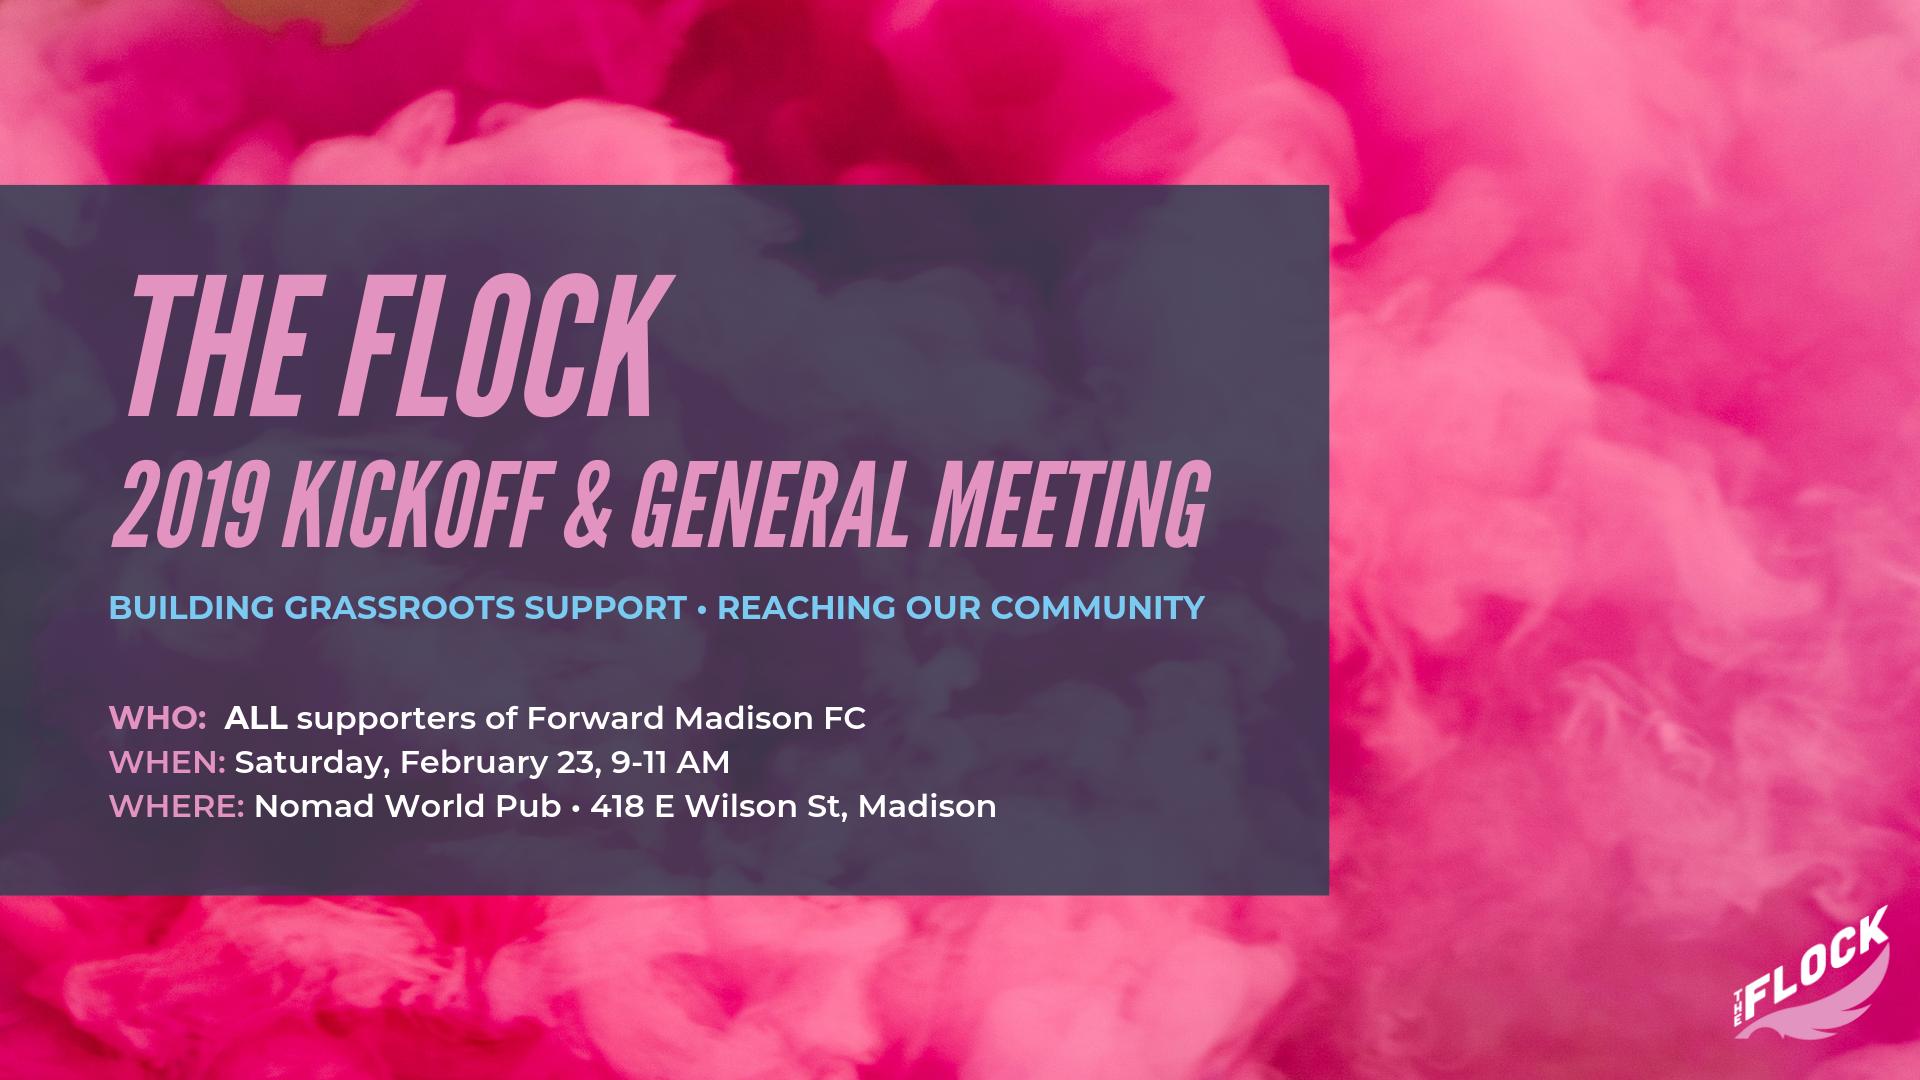 2019 Kickoff & General Meeting - FB Event Header (1).png